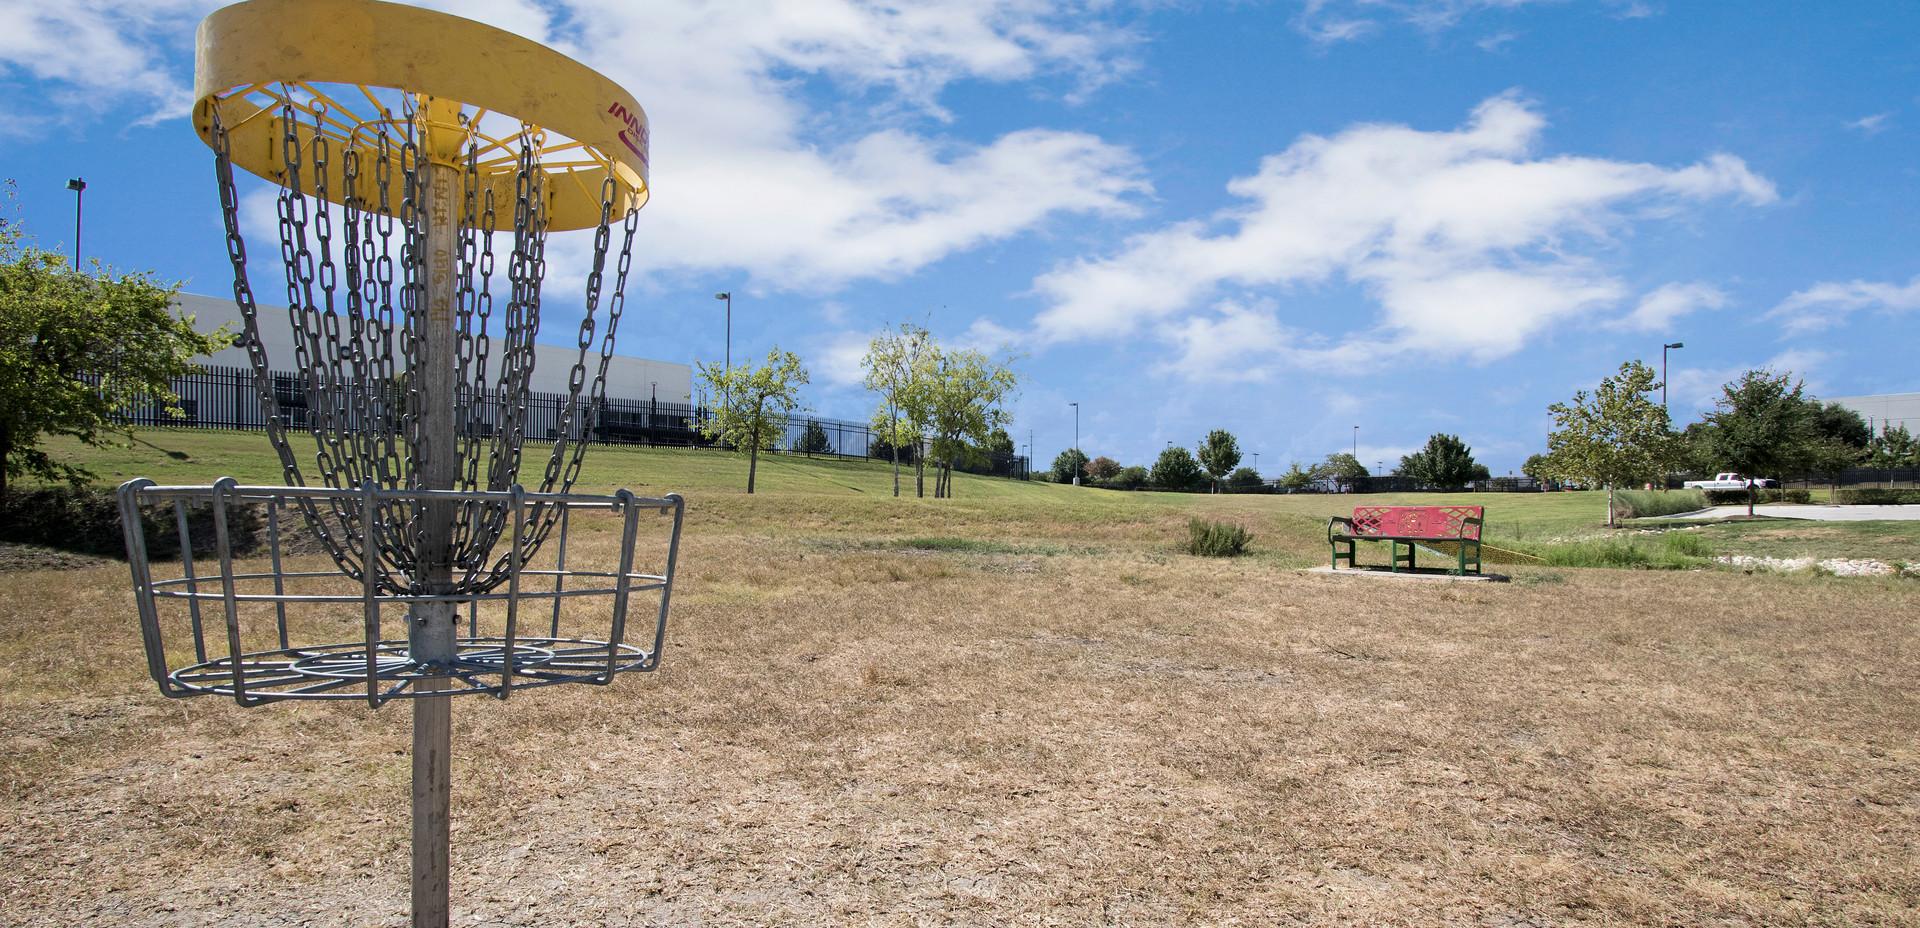 MetCenter Disc Golf Course